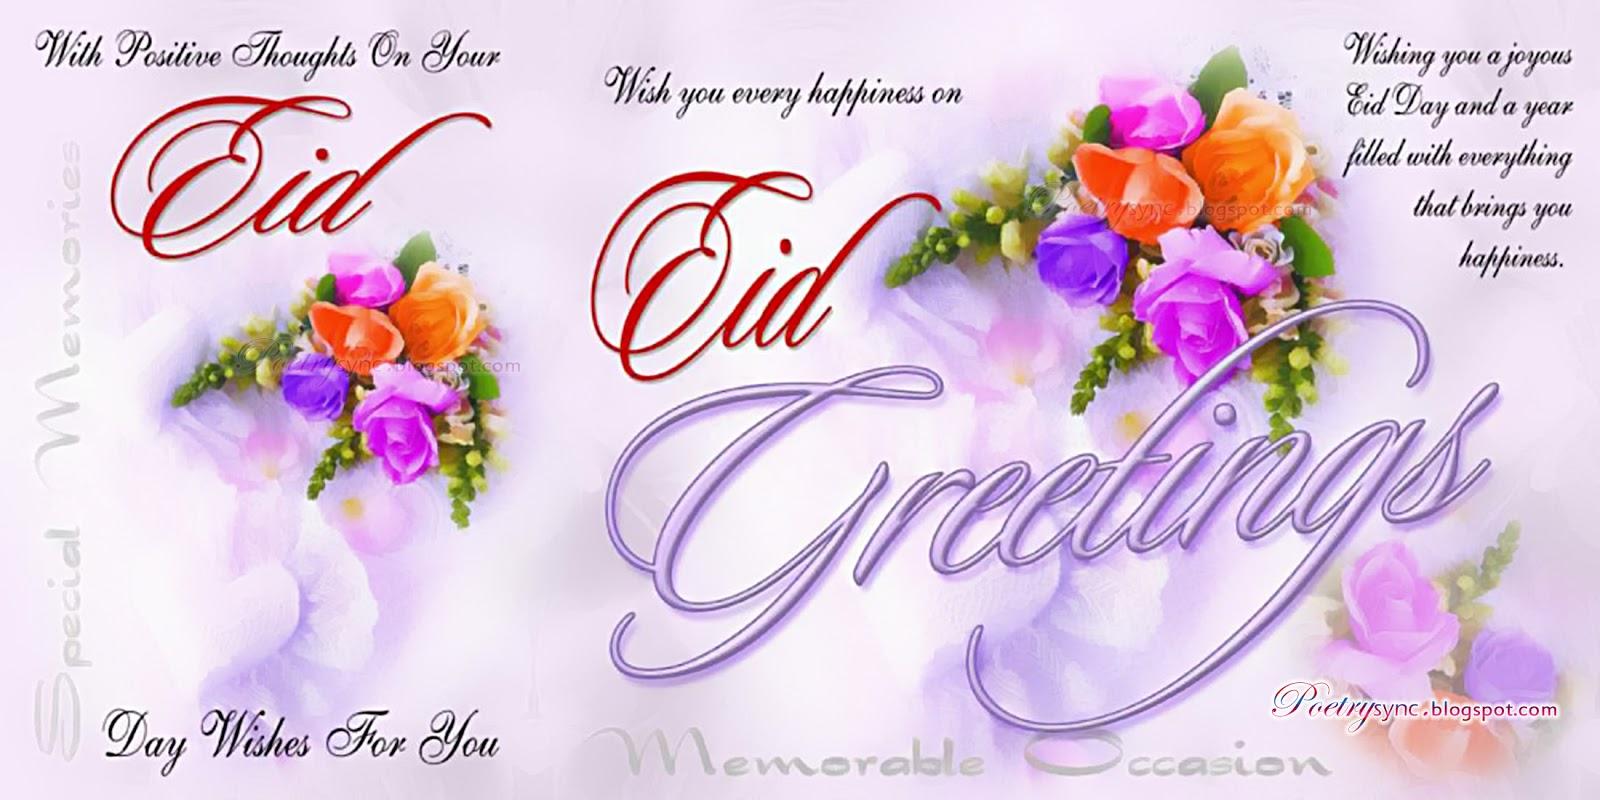 Eid Al Adha 2017 Eid Mubarak 2017 Greetings Images With Best Wishes